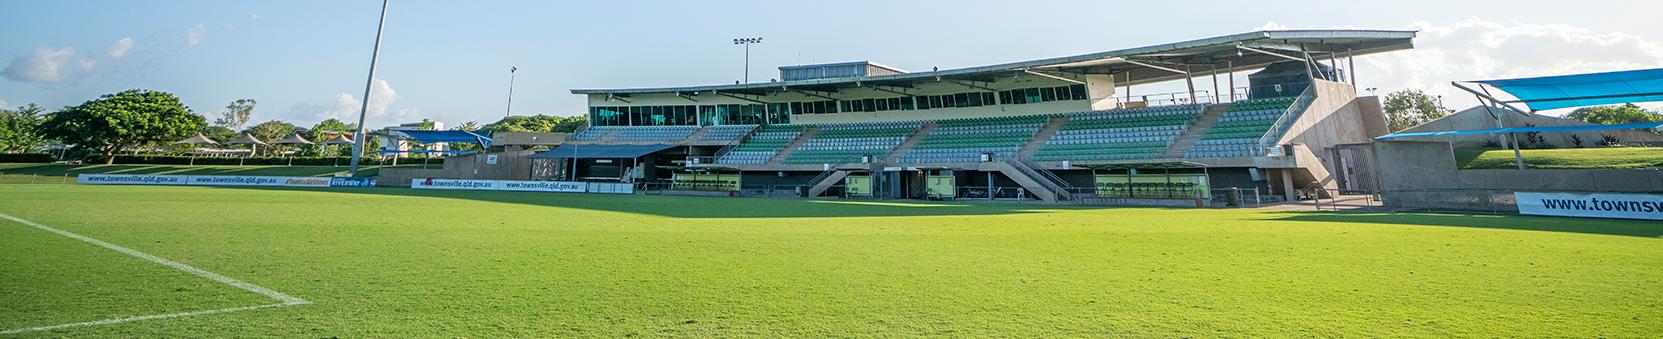 Riverway Stadium - Townsville City Council